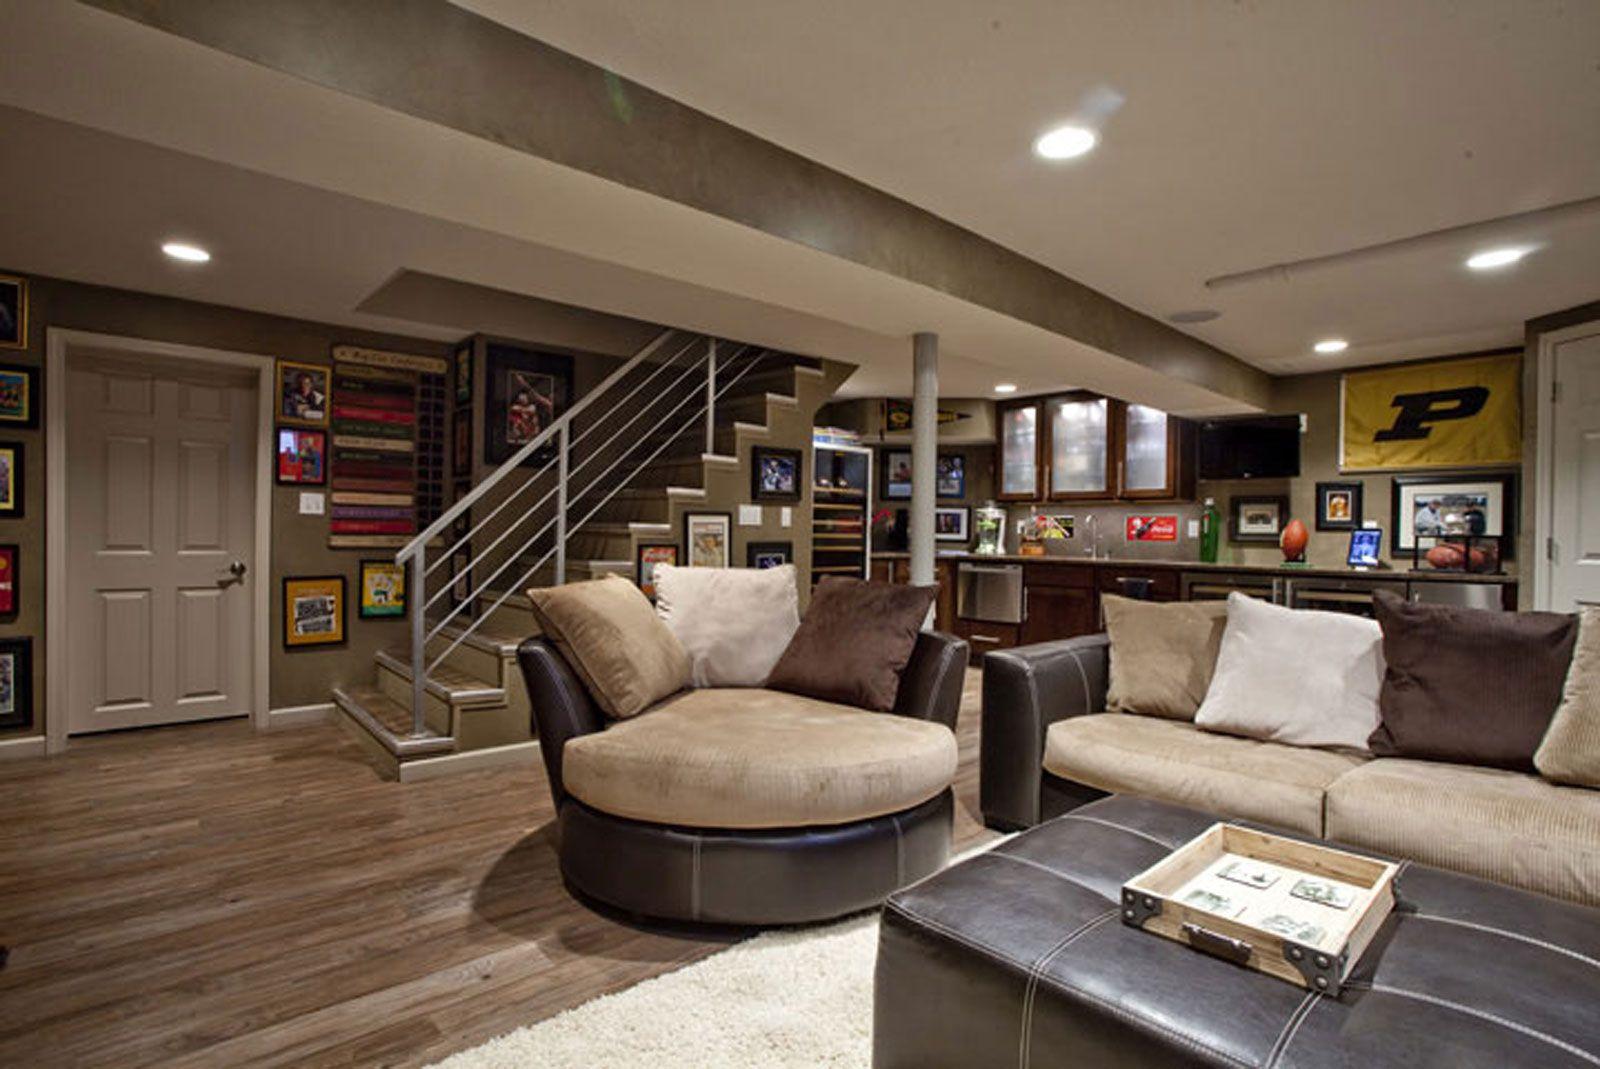 Ravinia West Lafayette Basement Remodel 2 | Design & Decorating ...